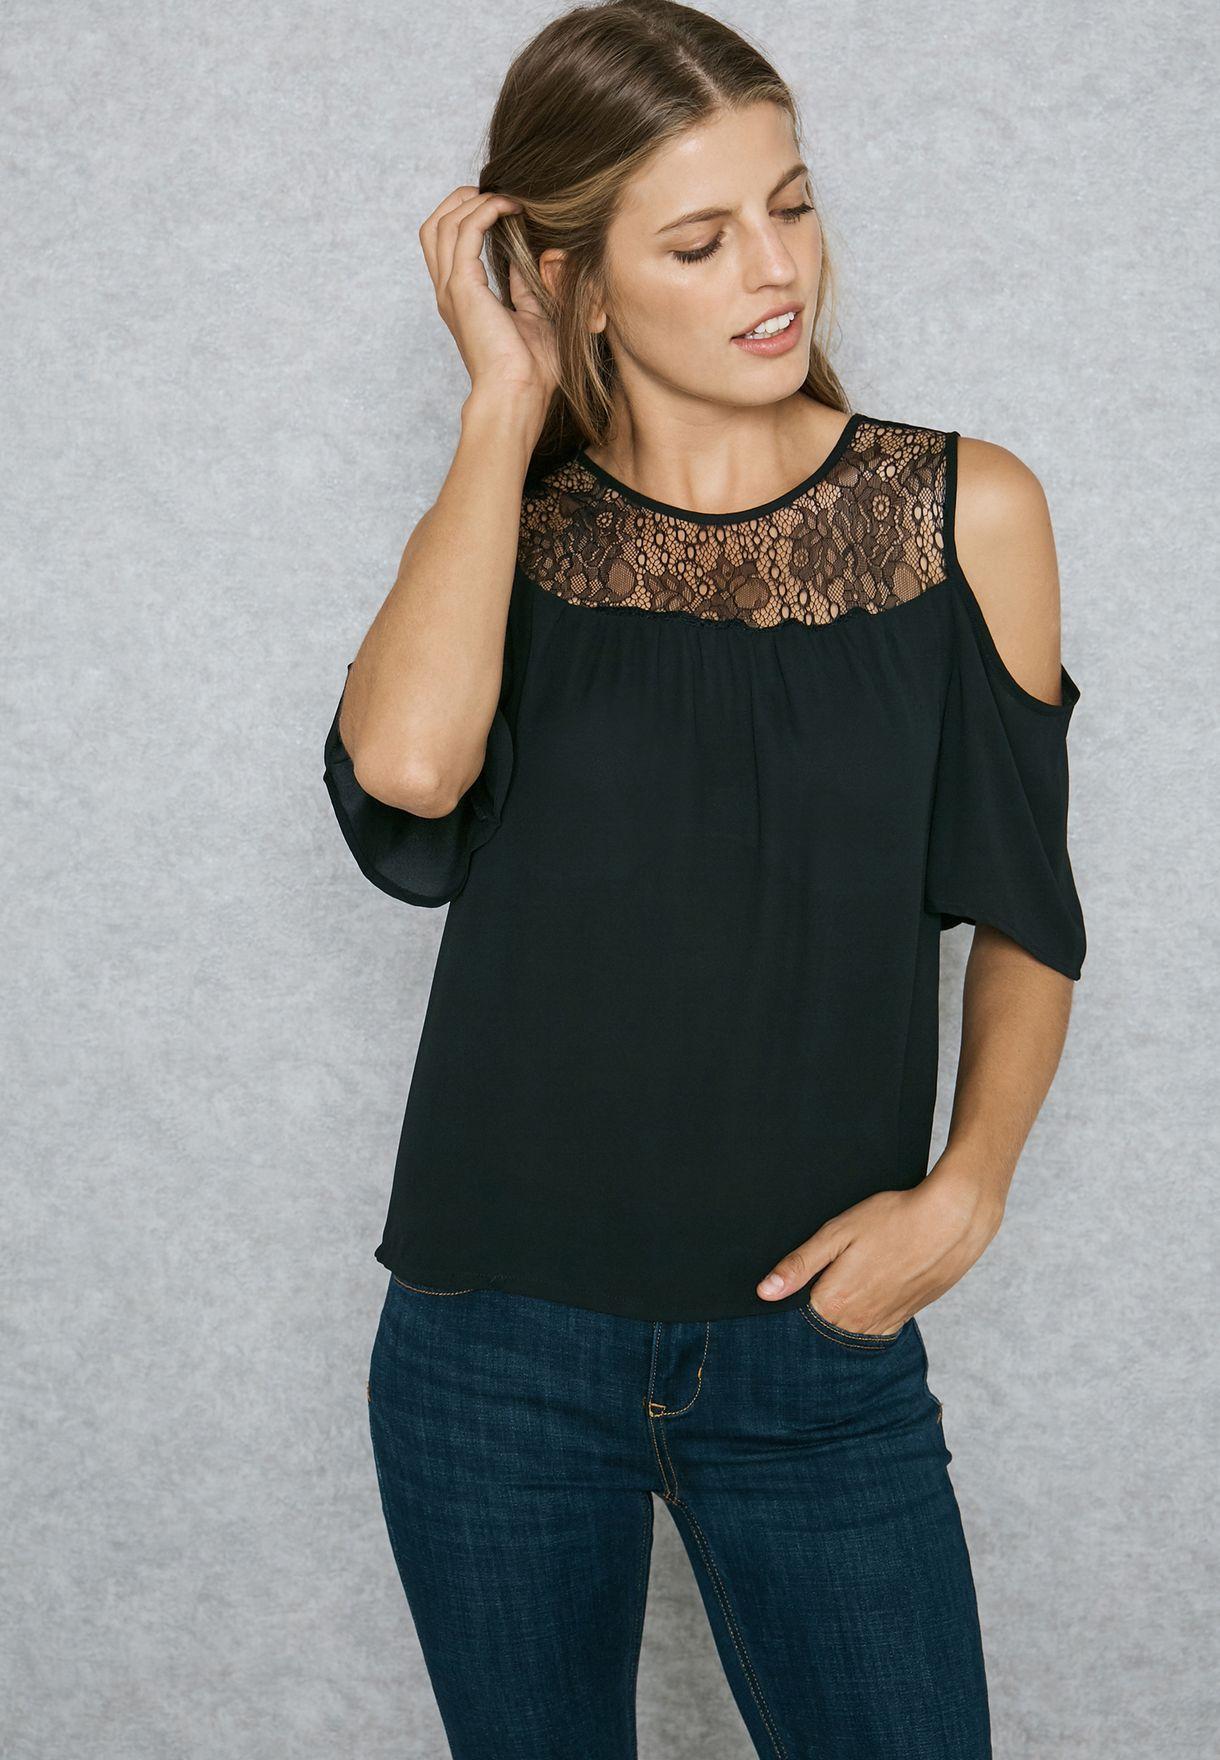 b548af7ffe Shop Jacqueline De Yong black Cold Shoulder Top 15137210 for Women ...